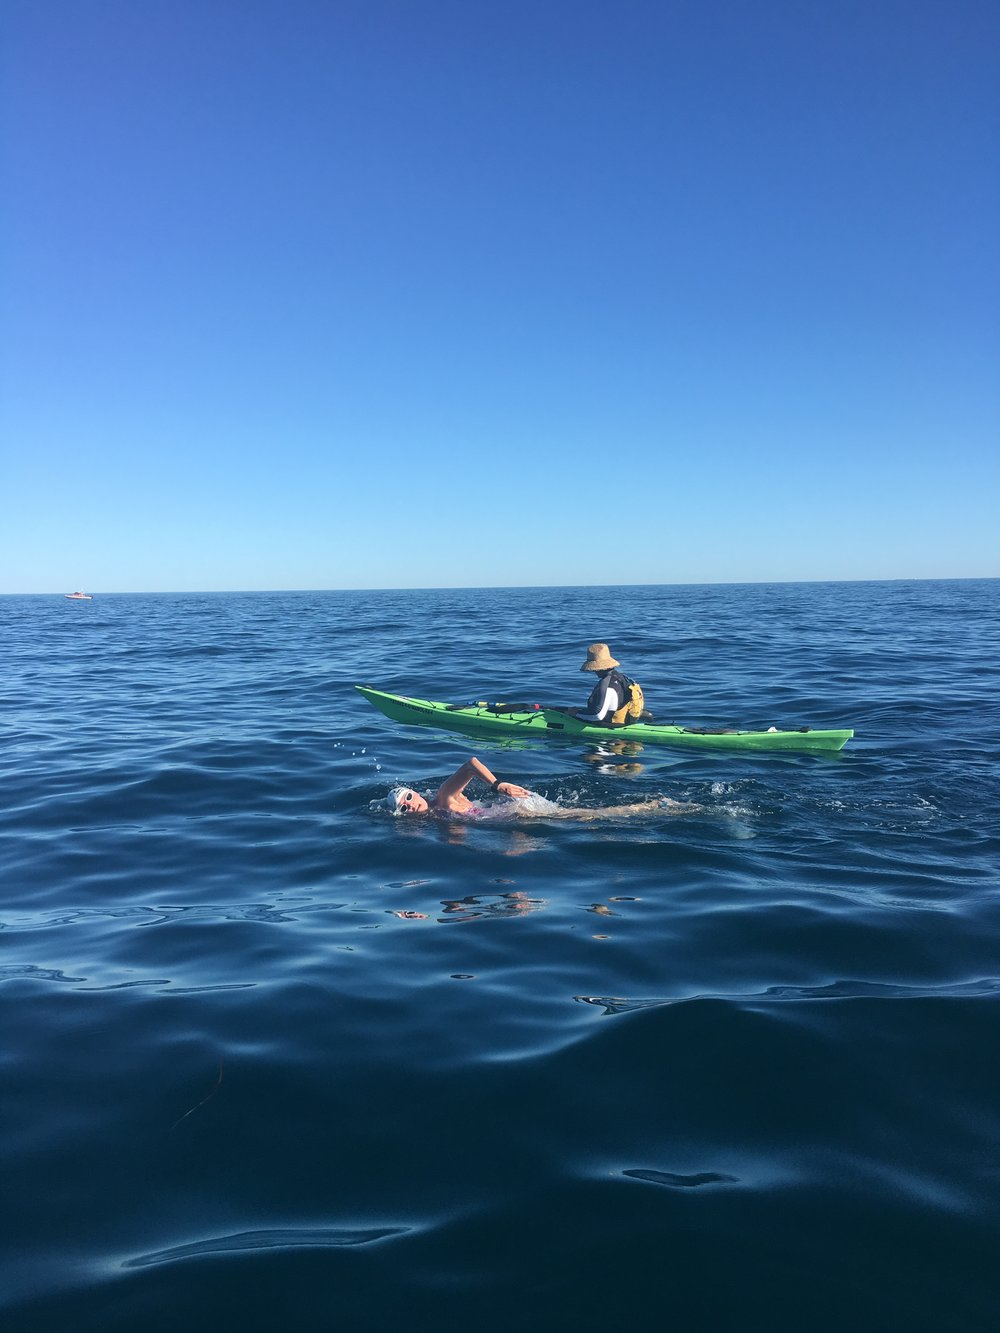 Rottnest Channel, 19.7km, 2016